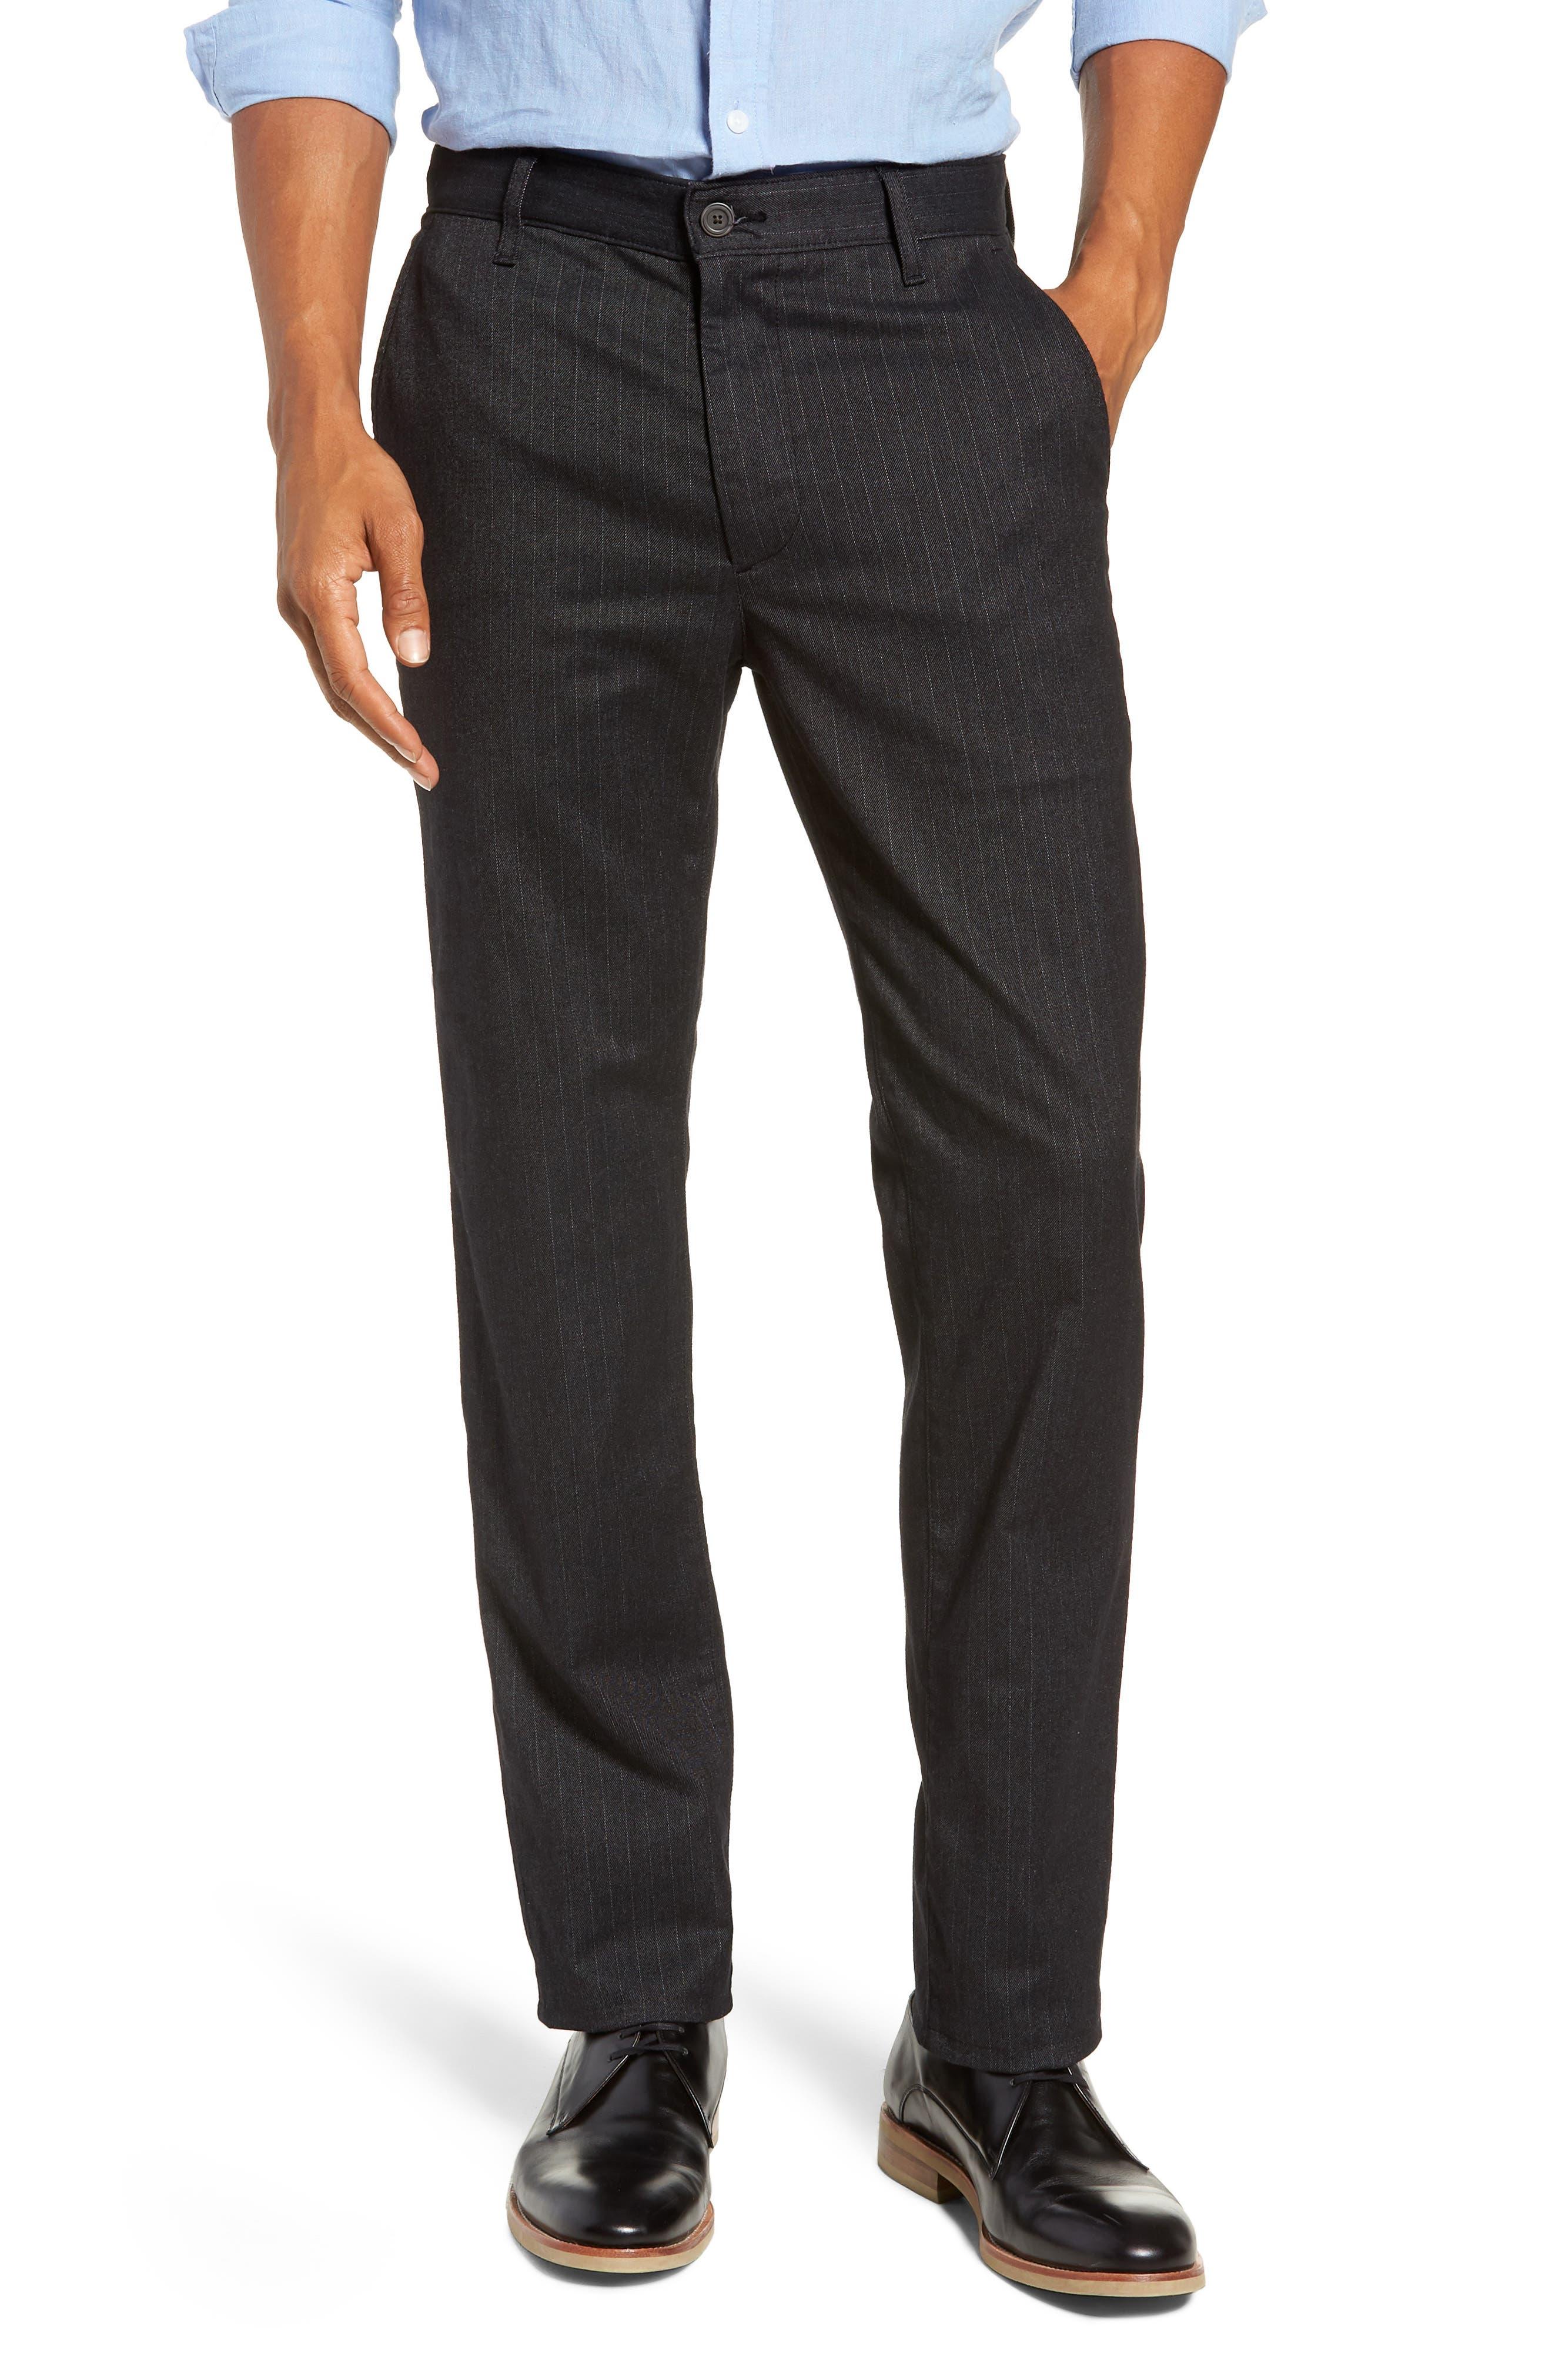 Marshall Slim Fit Pinstripe Pants,                             Main thumbnail 1, color,                             HEATHERED MELANGE BLACK